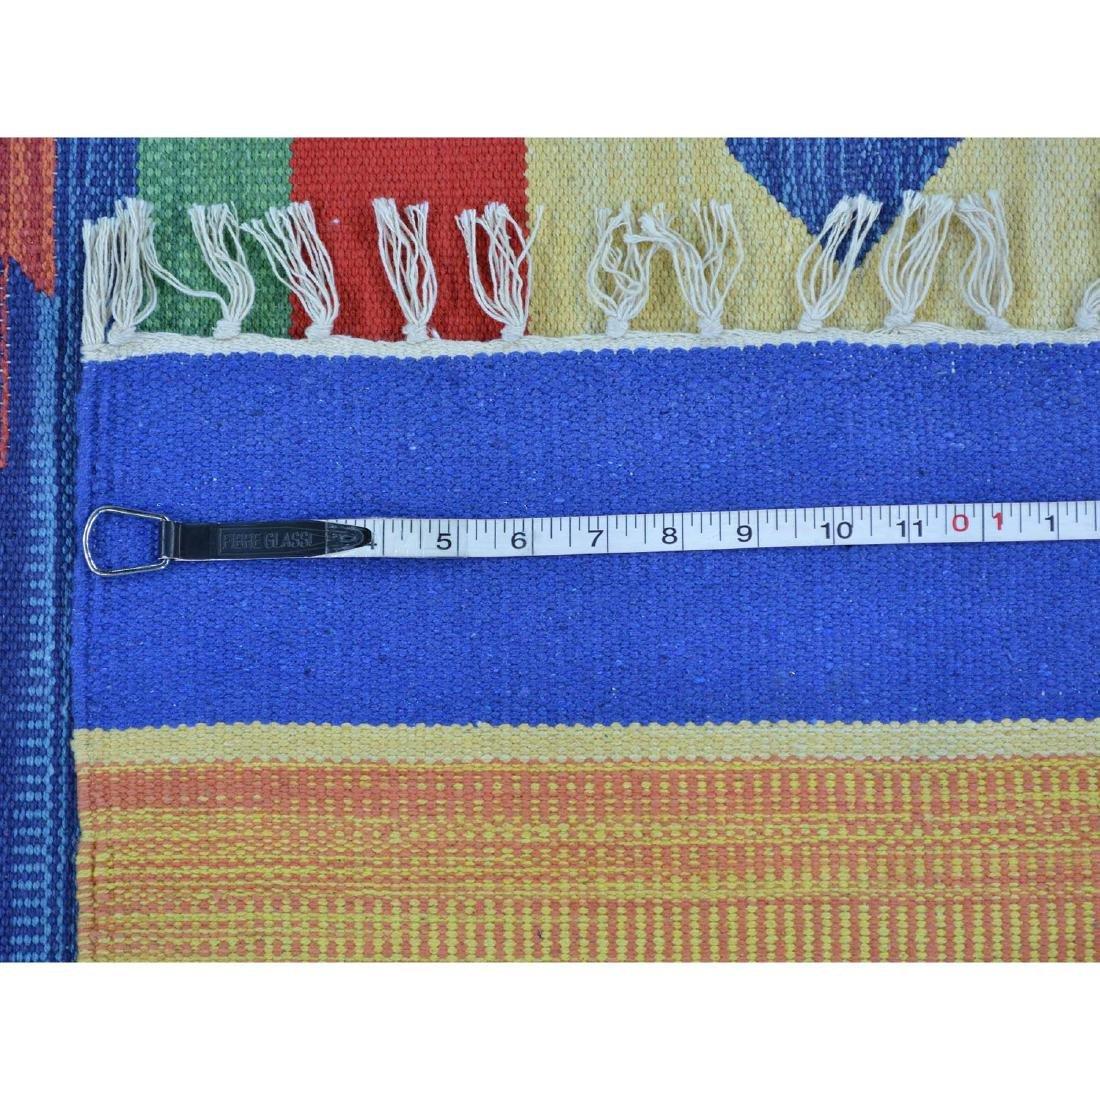 Flat Weave Kilim Hand Woven Navajo Design Rug 6x6.1 - 5